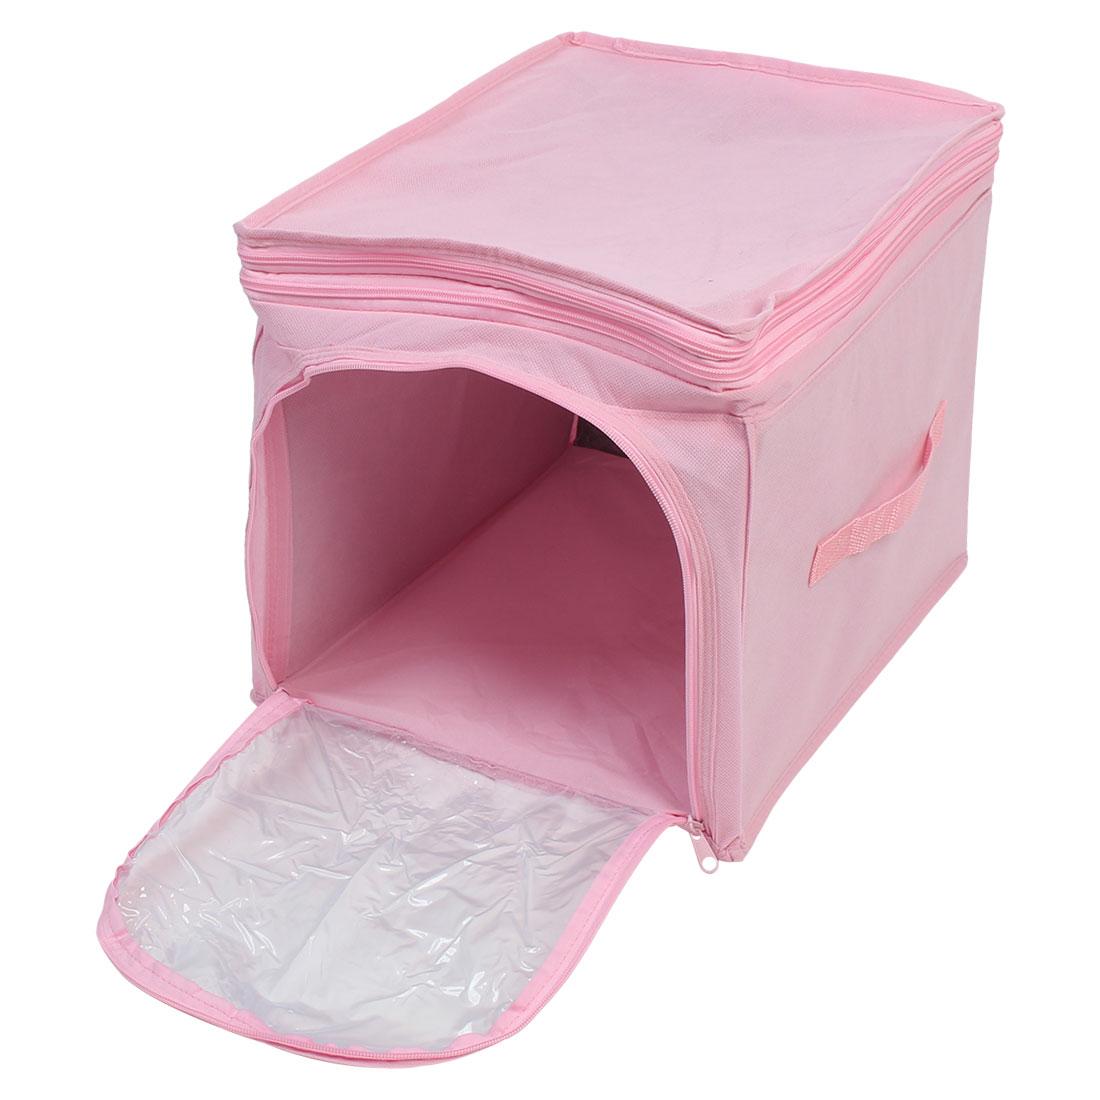 Home Wardrobe Adjustable Foldable Visual Clothing Storage Box Finishing Bag Pink